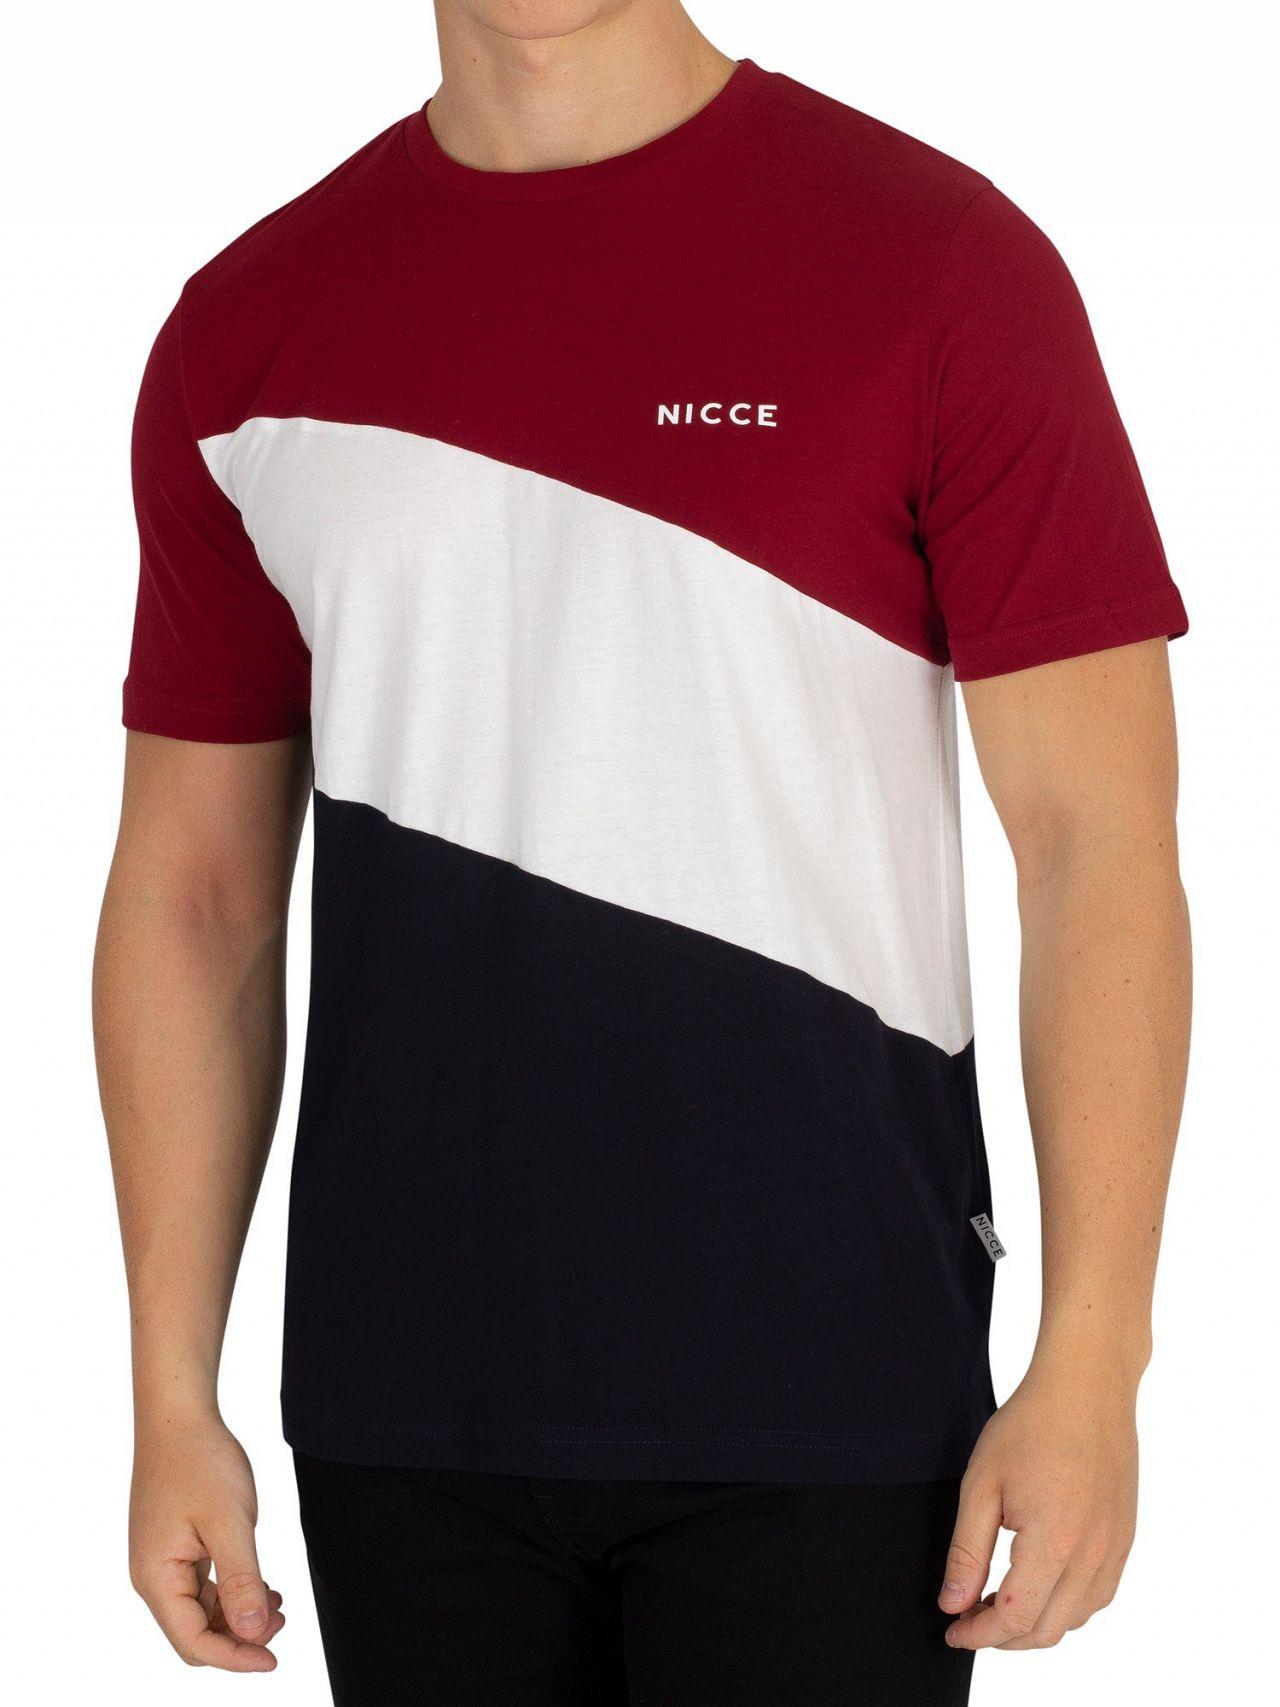 46cfed67b8 Nicce London Merlot/White/Deep Navy Triad T-Shirt | Standout